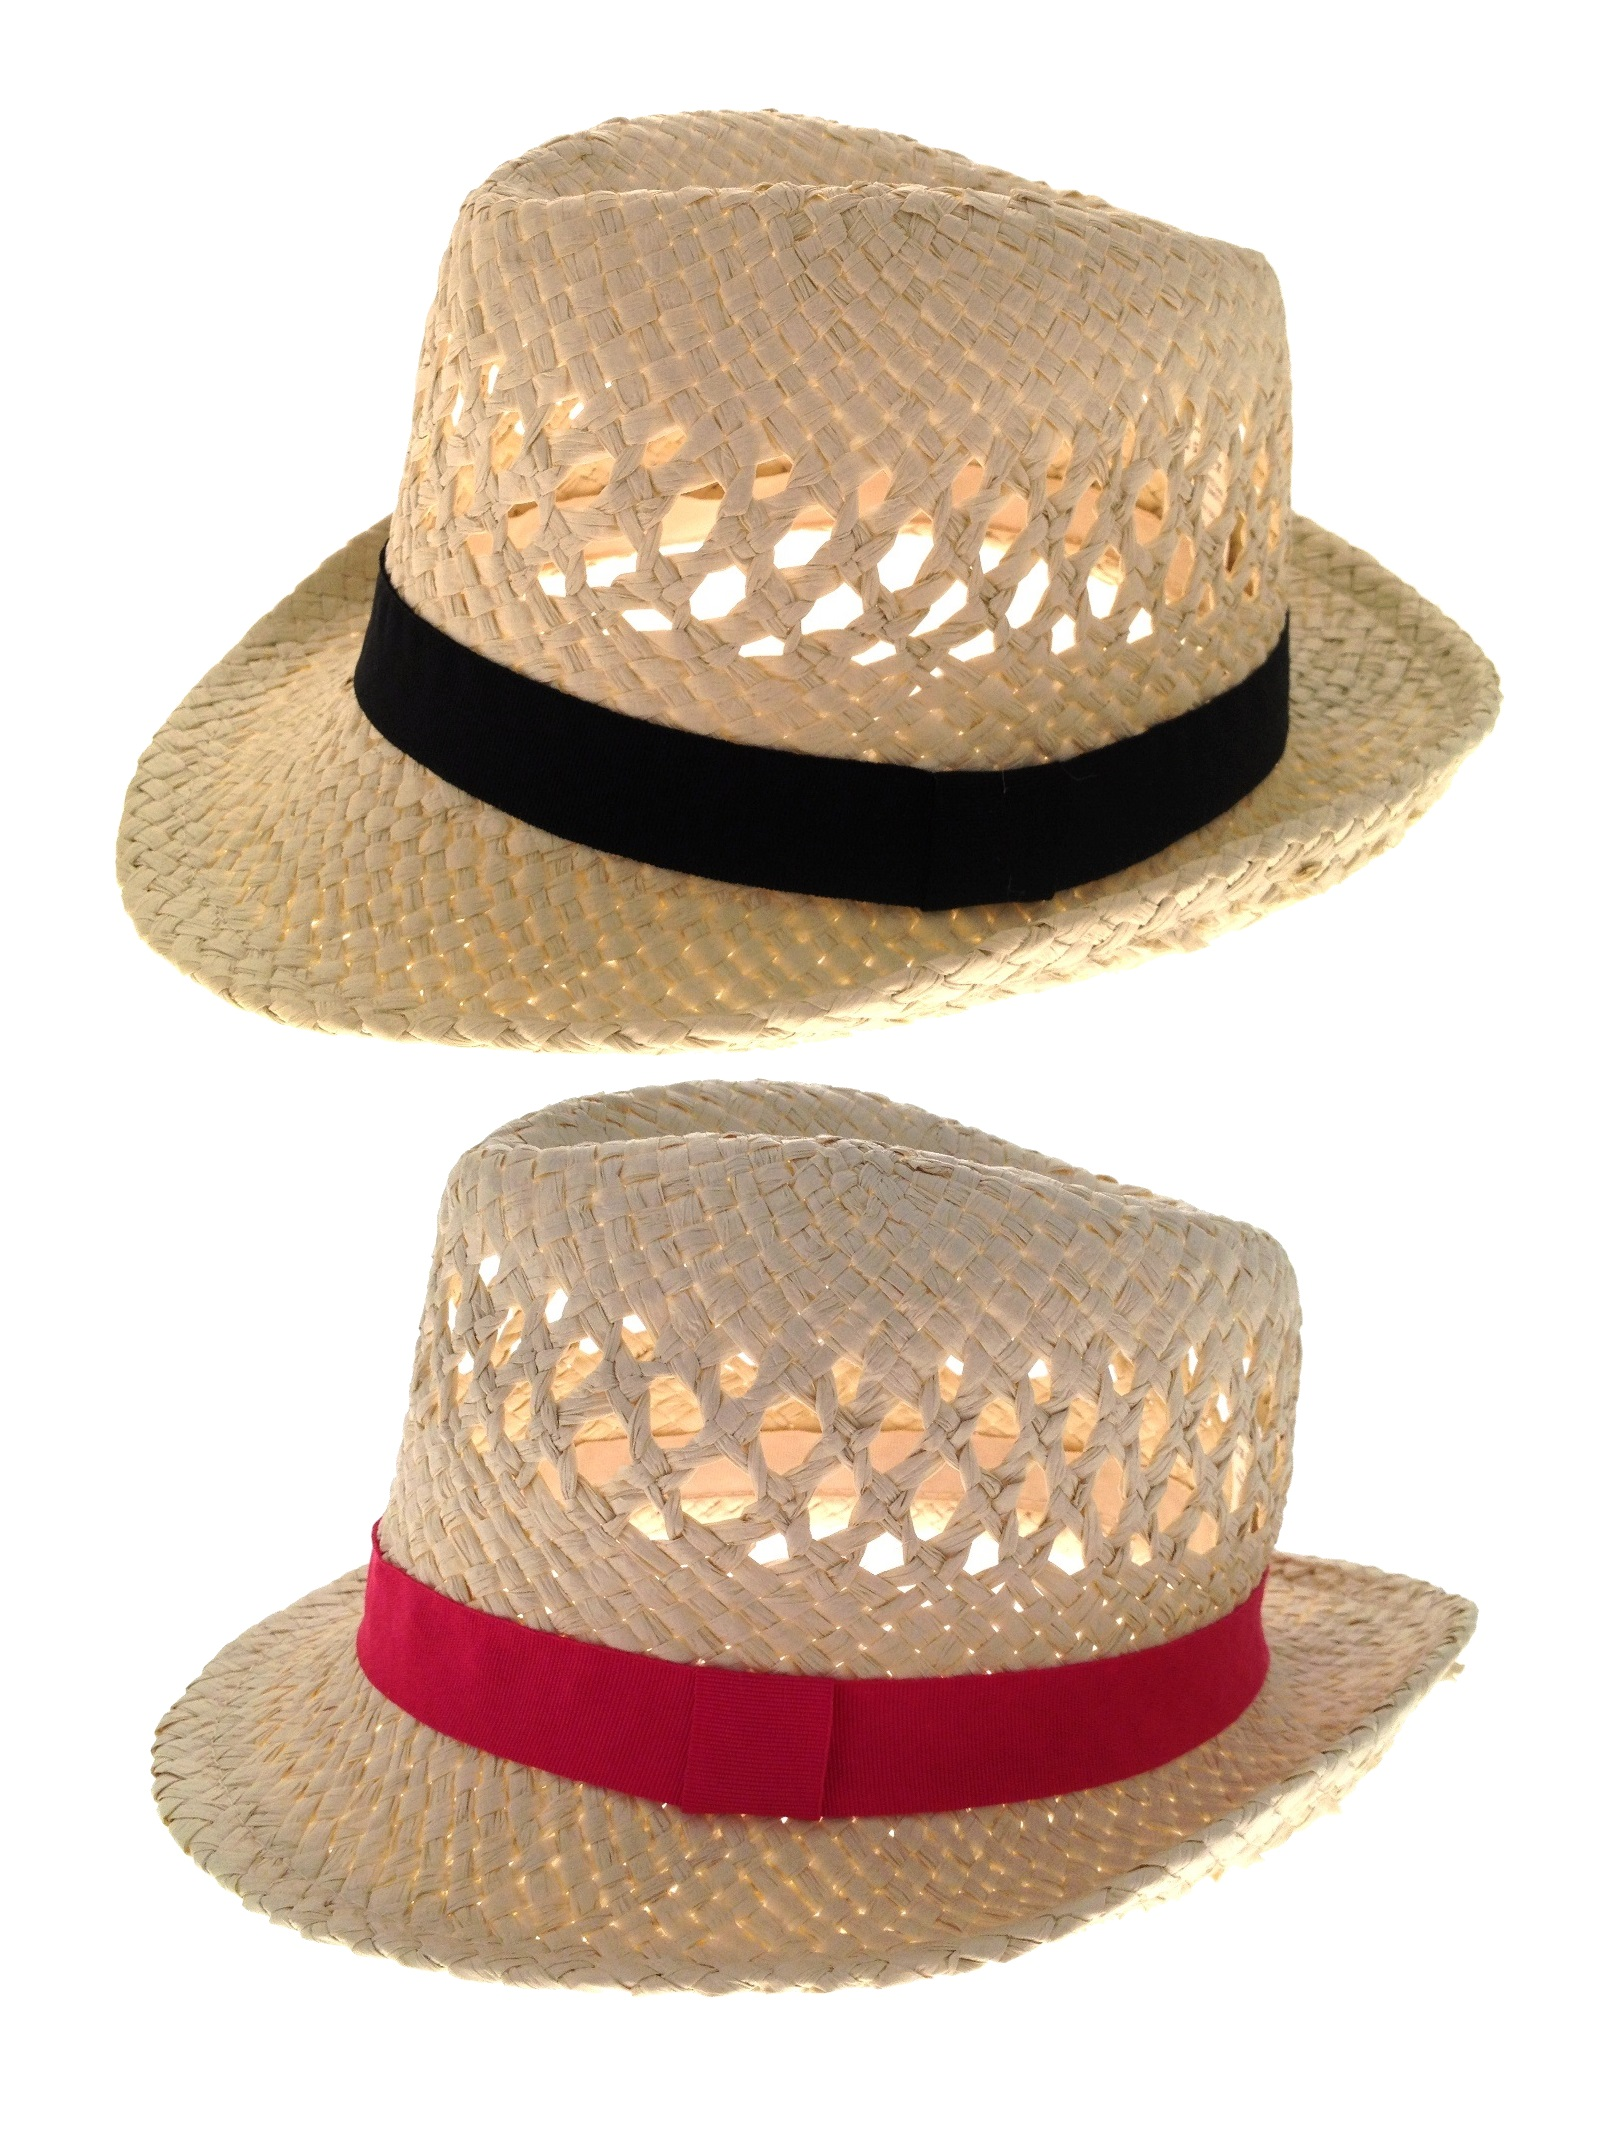 Para-Mujer-De-Paja-Verano-Sombrero-Semi-ala-Unisex-Sol-Panama-Fedora-Para-Hombre-Trilby-Sombrero miniatura 14